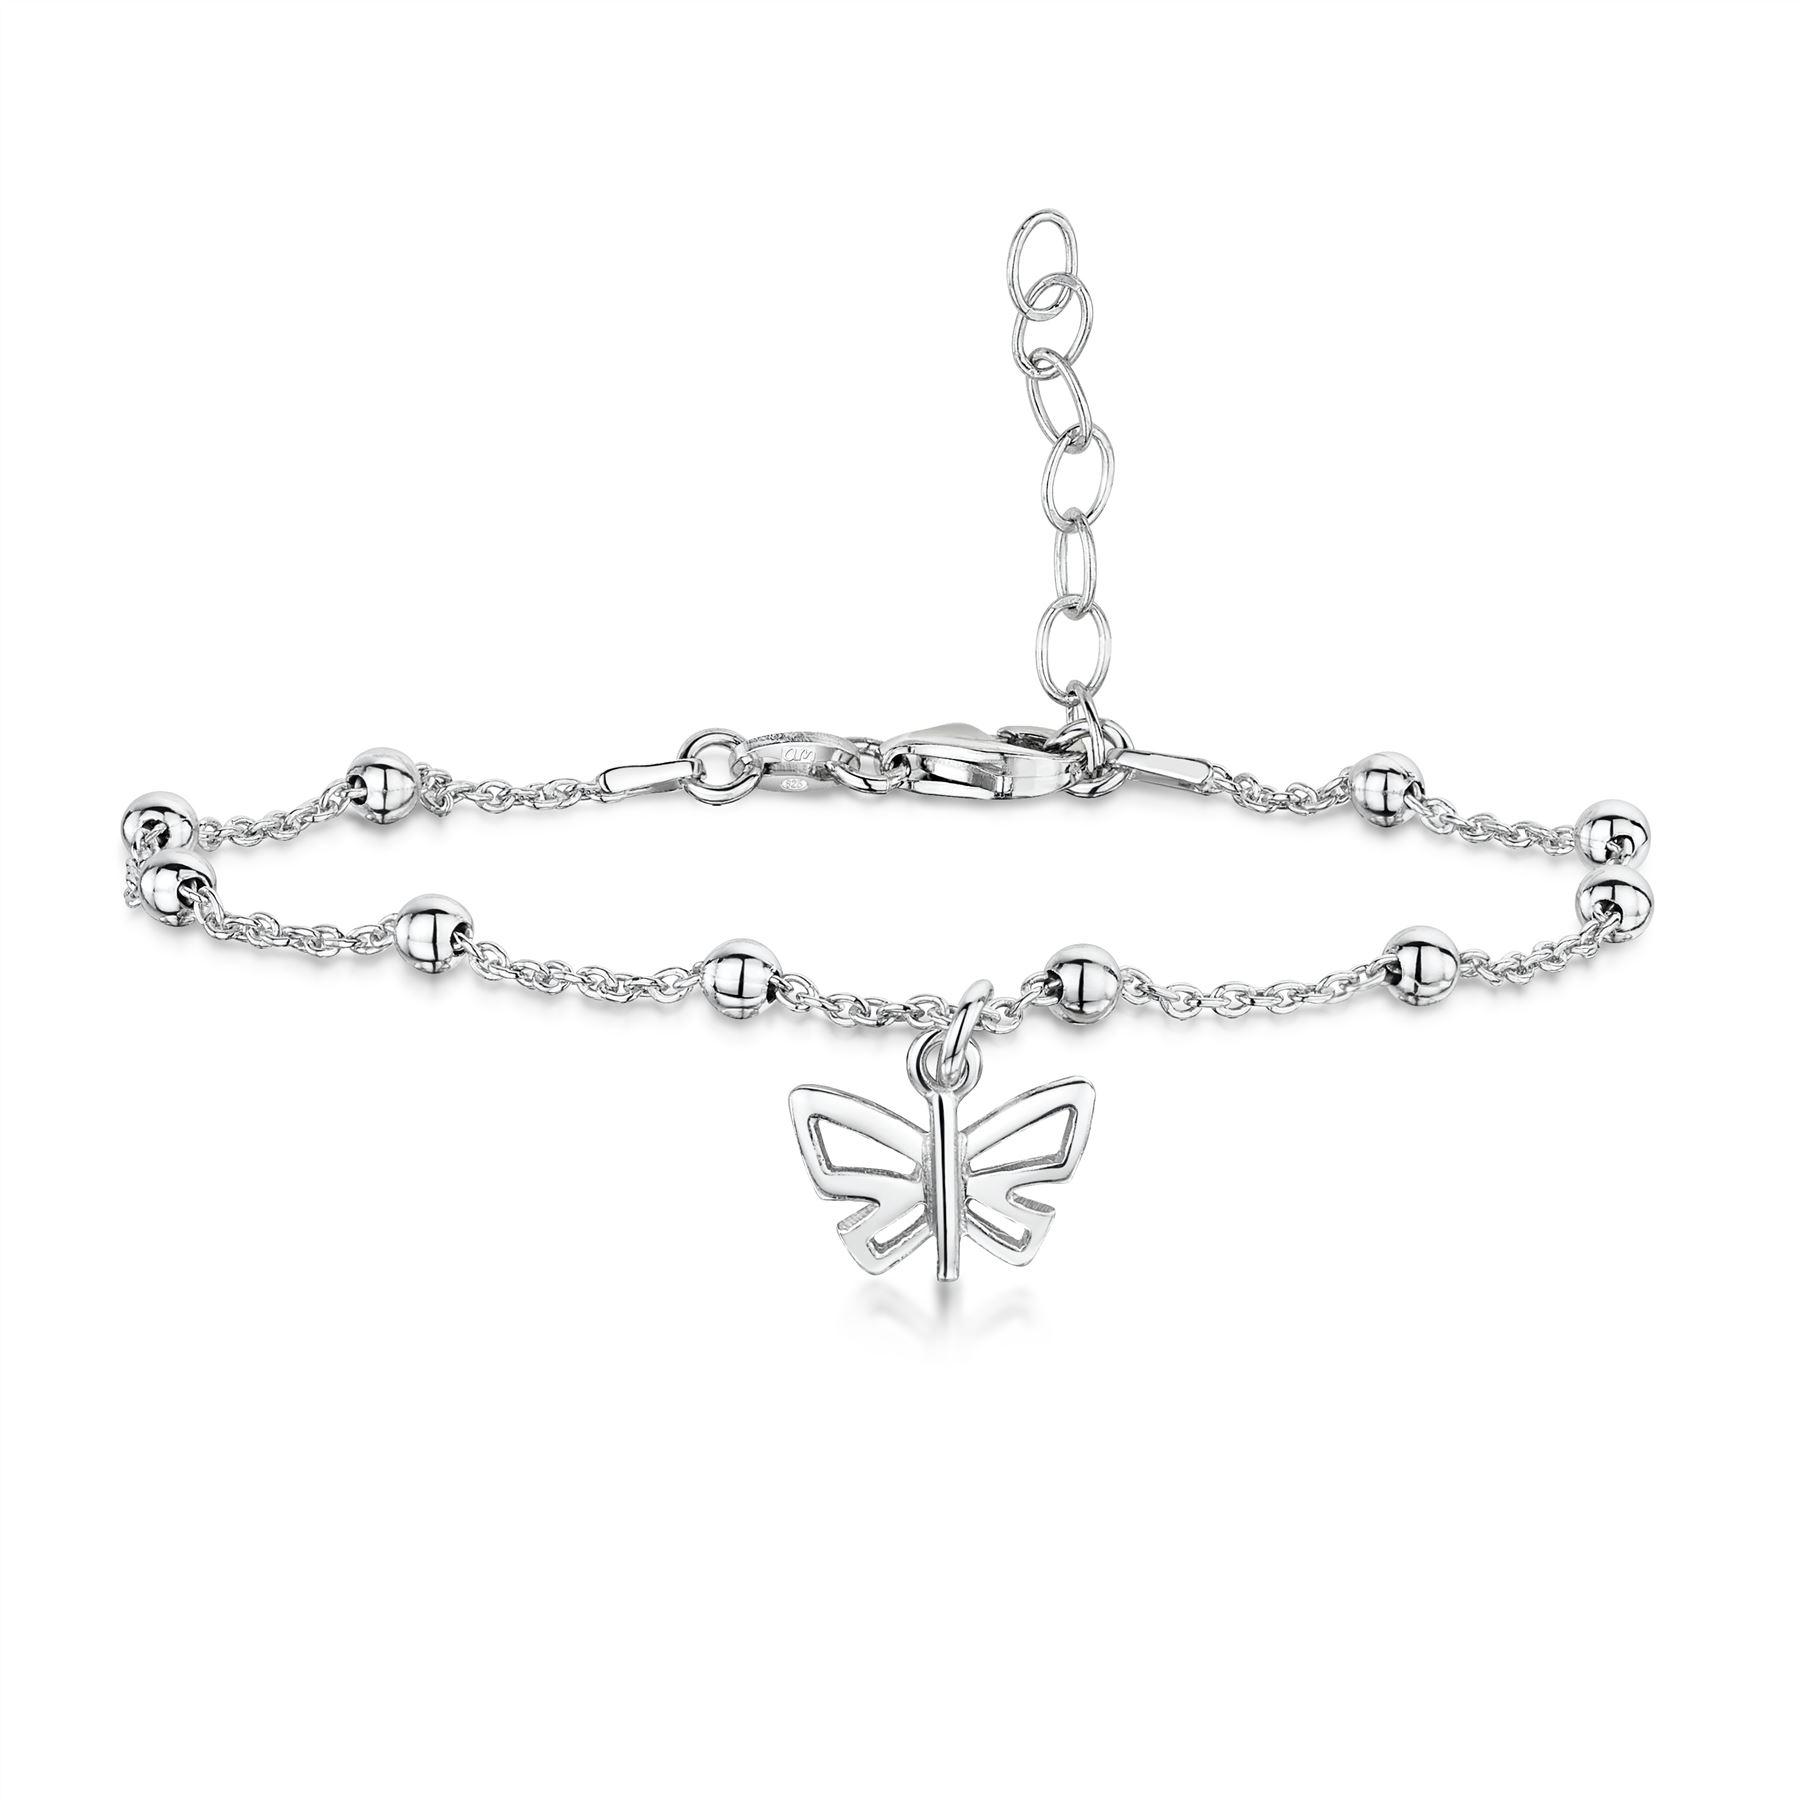 Amberta-Jewelry-925-Sterling-Silver-Adjustable-Bracelet-Italian-Bangle-for-Women miniature 36